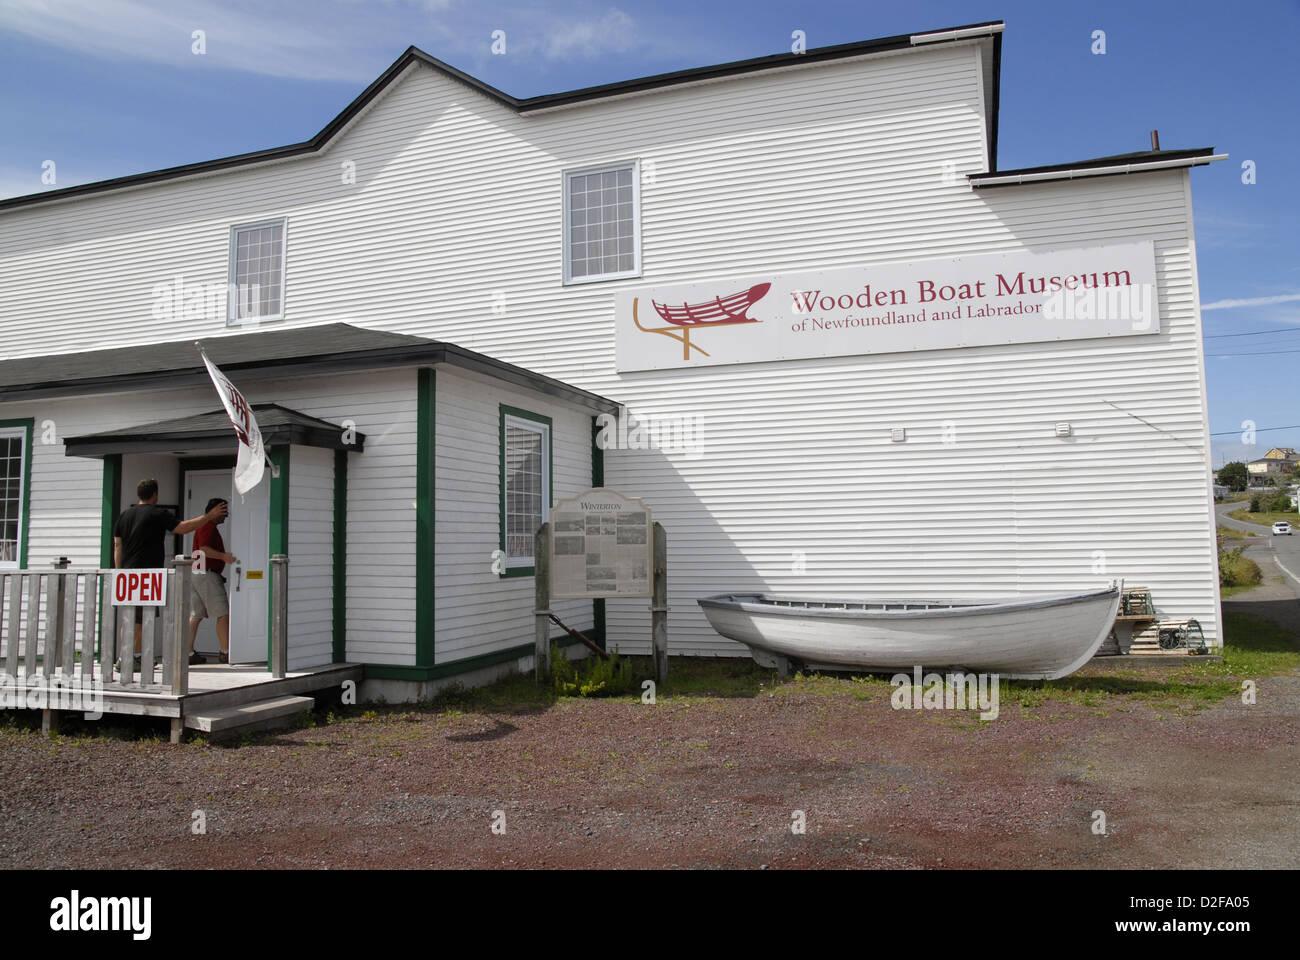 The Wooden Boat Museum Winterton Newfoundland Stock Photo